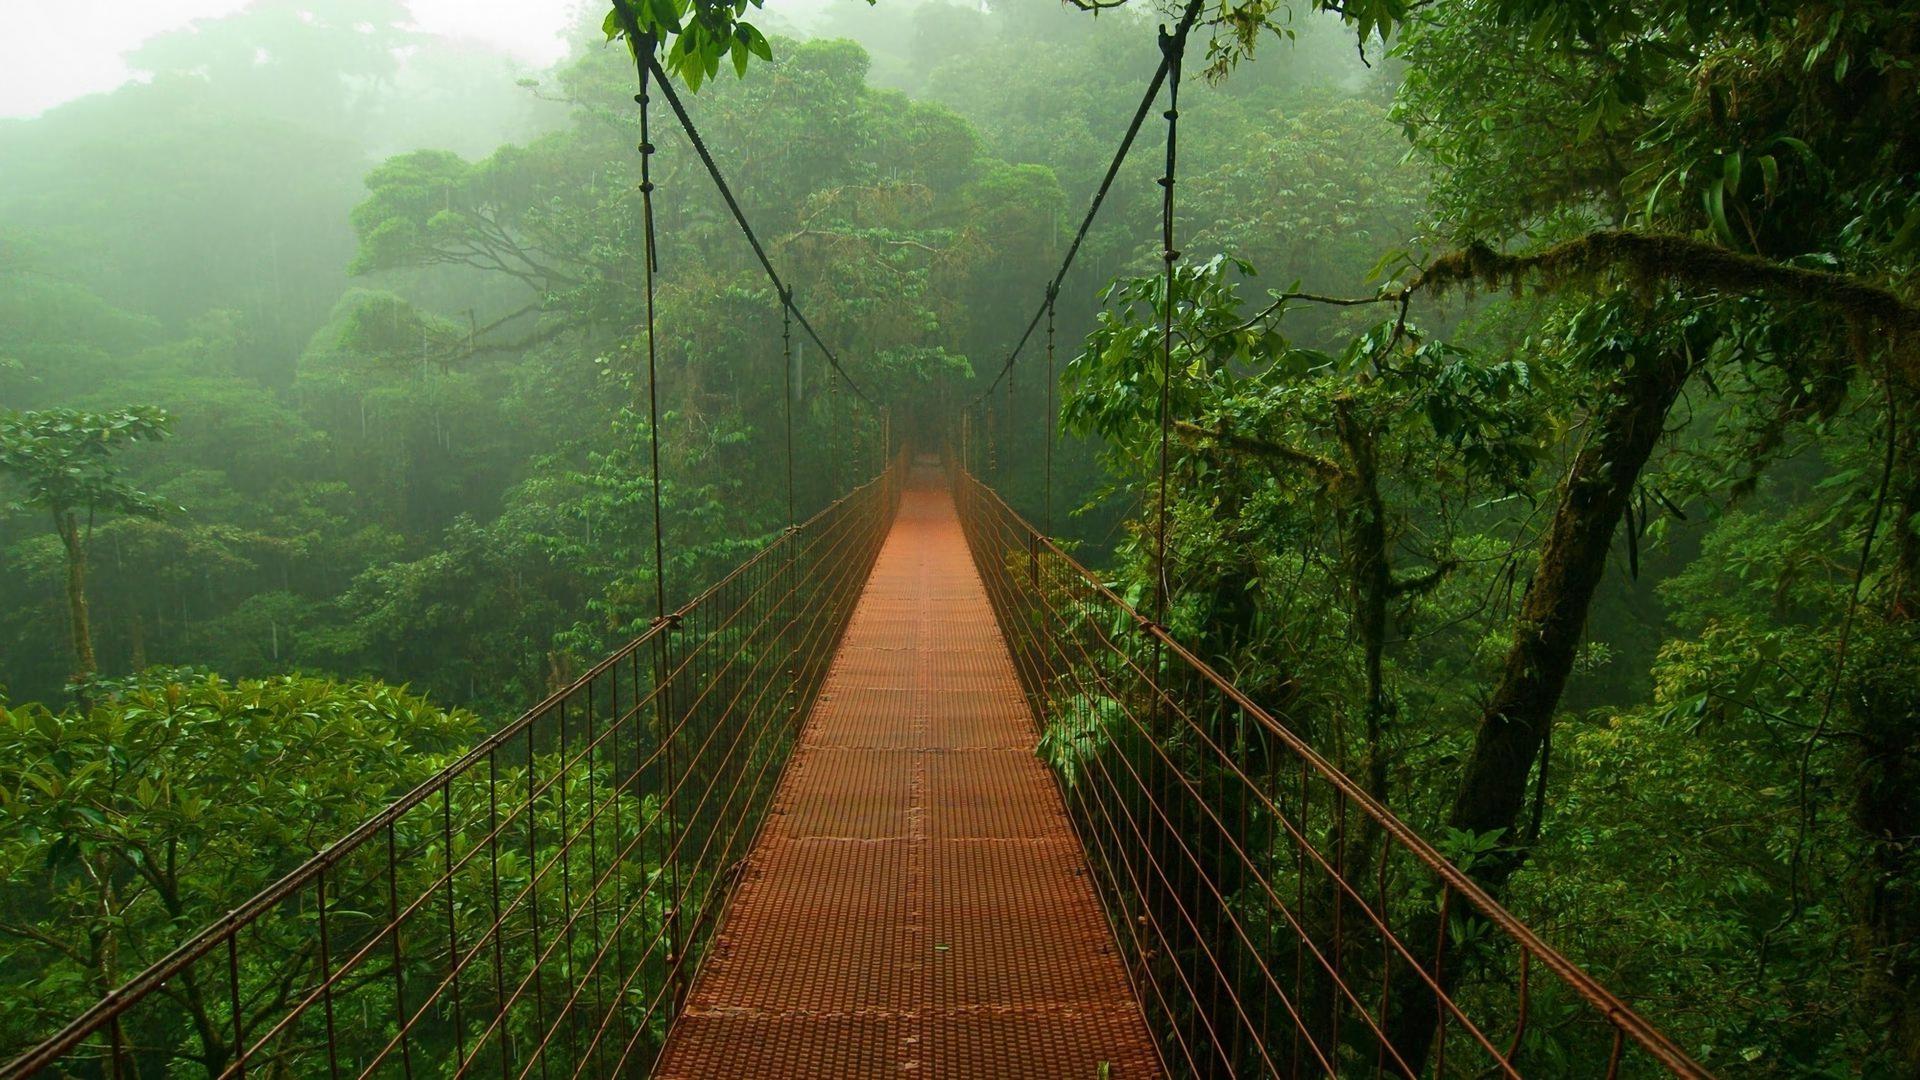 Menschengemacht - Brücke Wald Rainforest Dschungel Wallpaper - Dschungel Hintergrund PNG